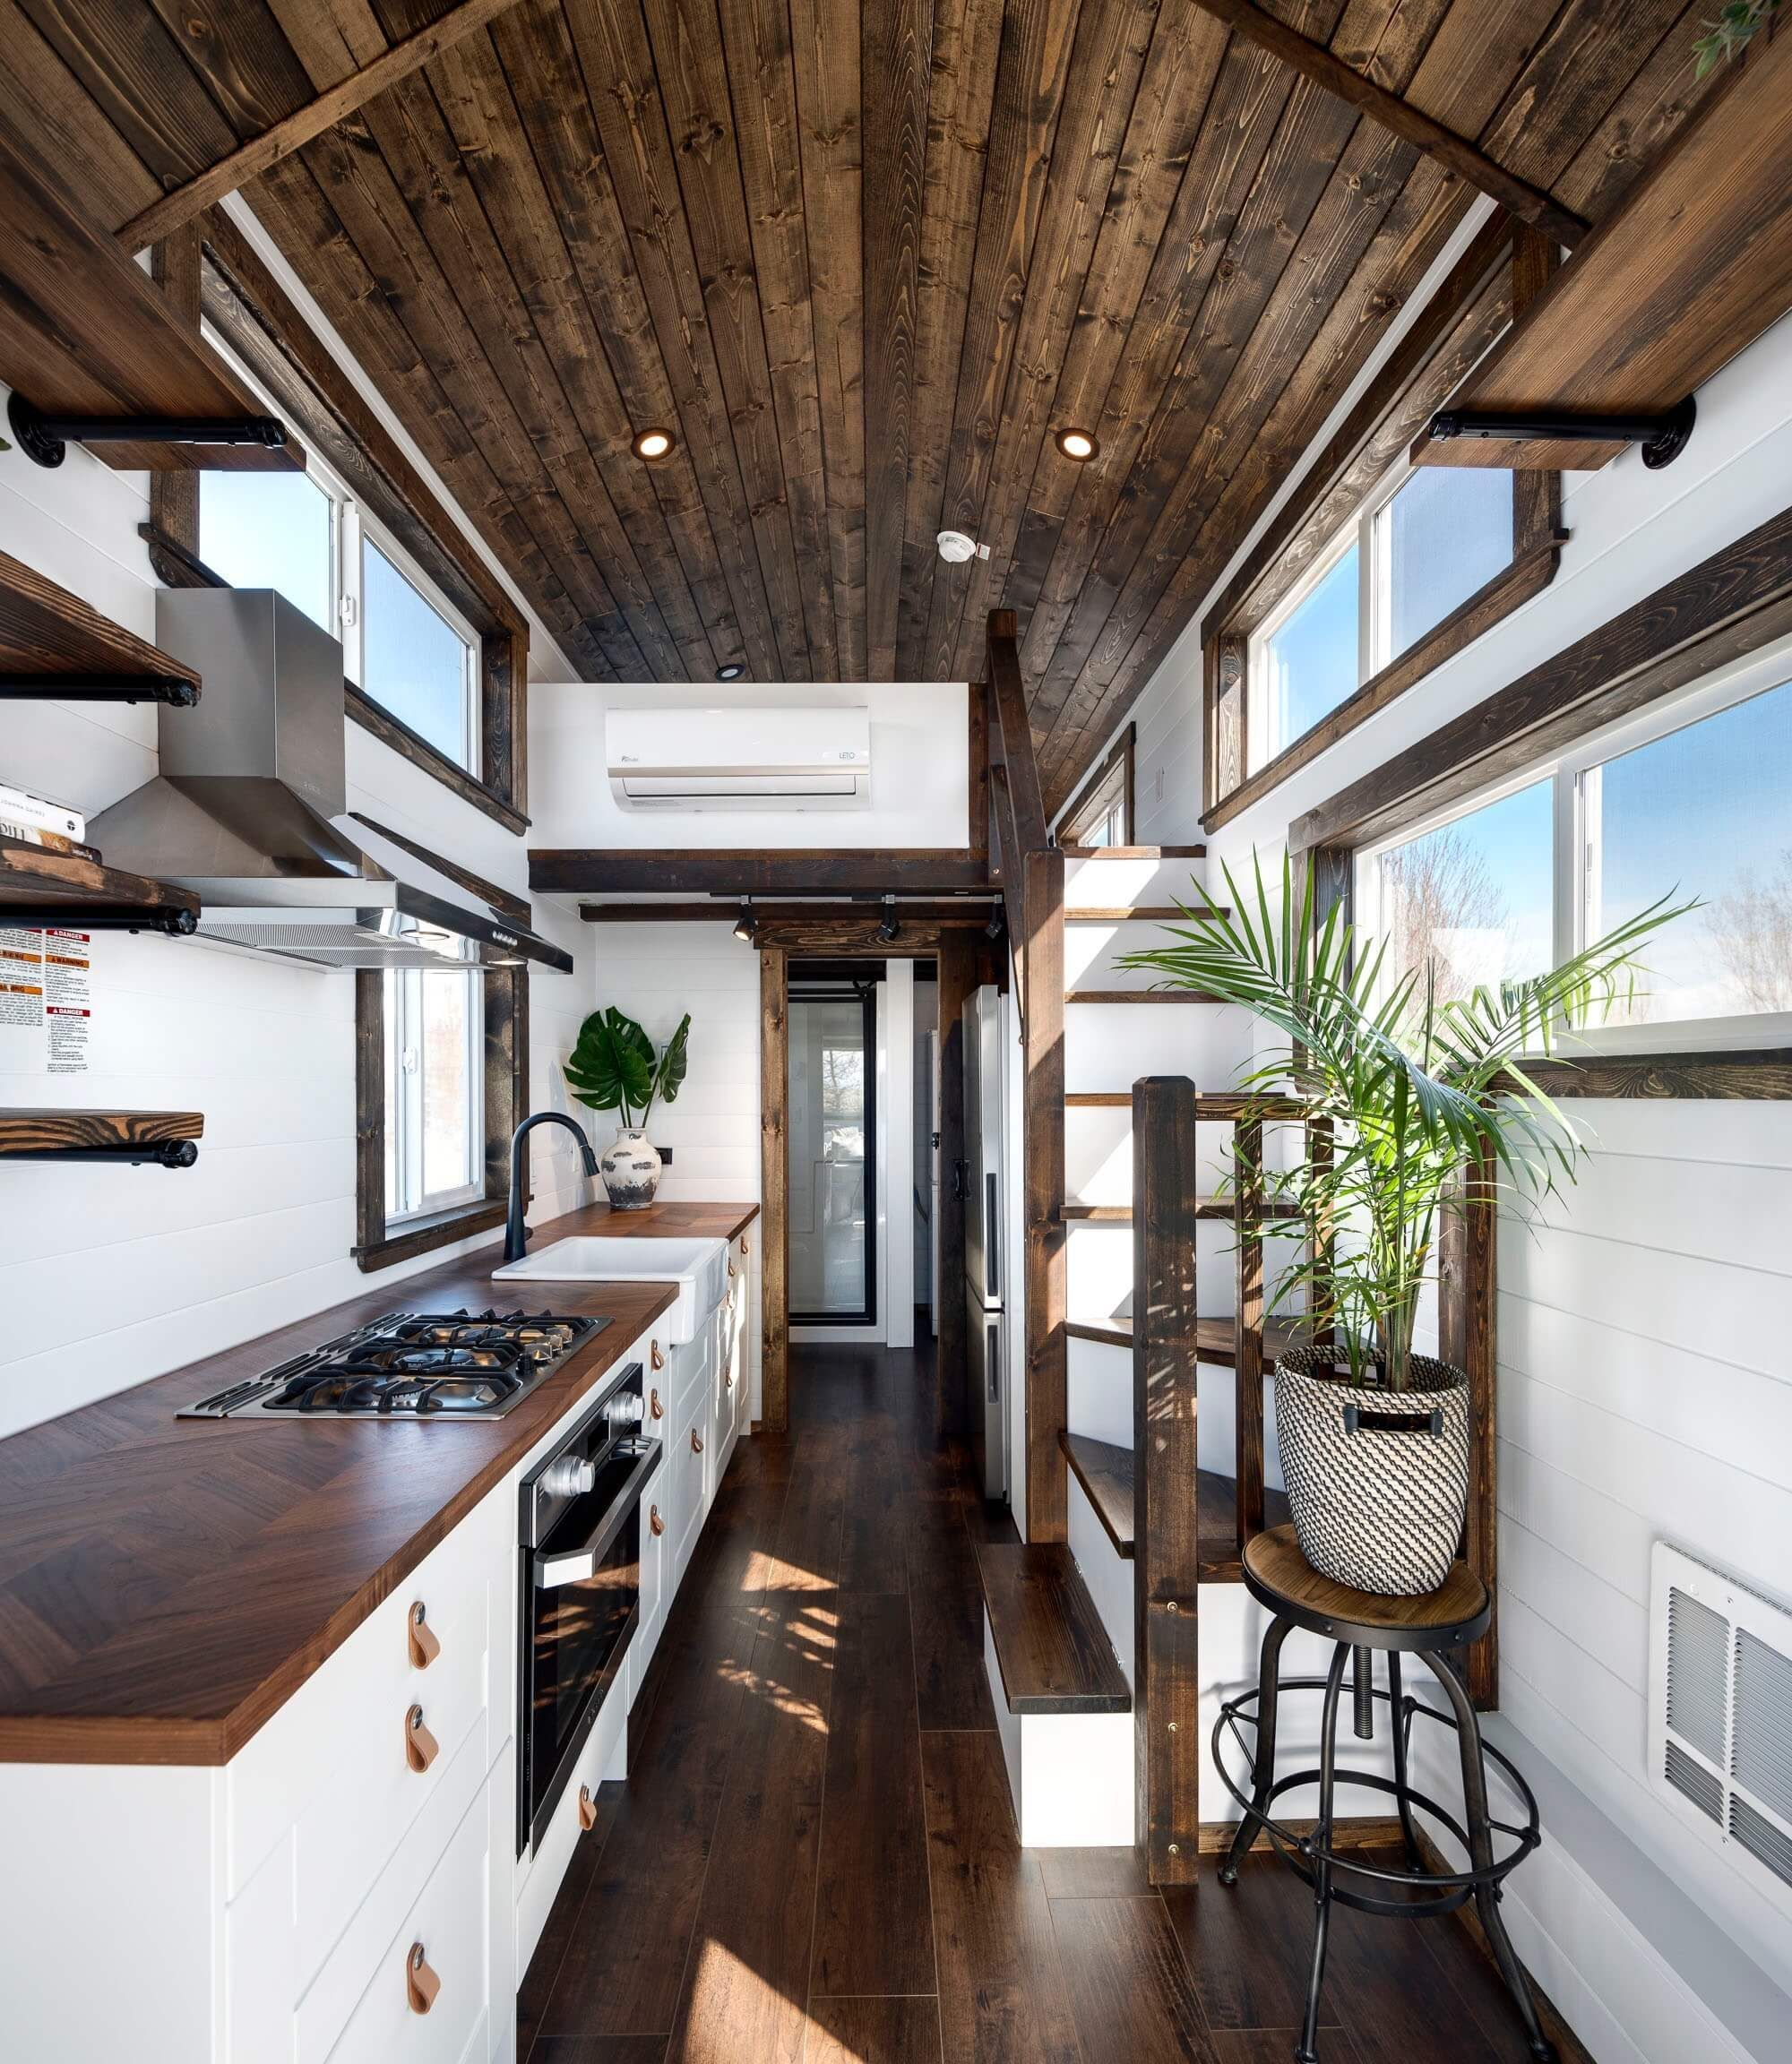 A Mint tiny house interior